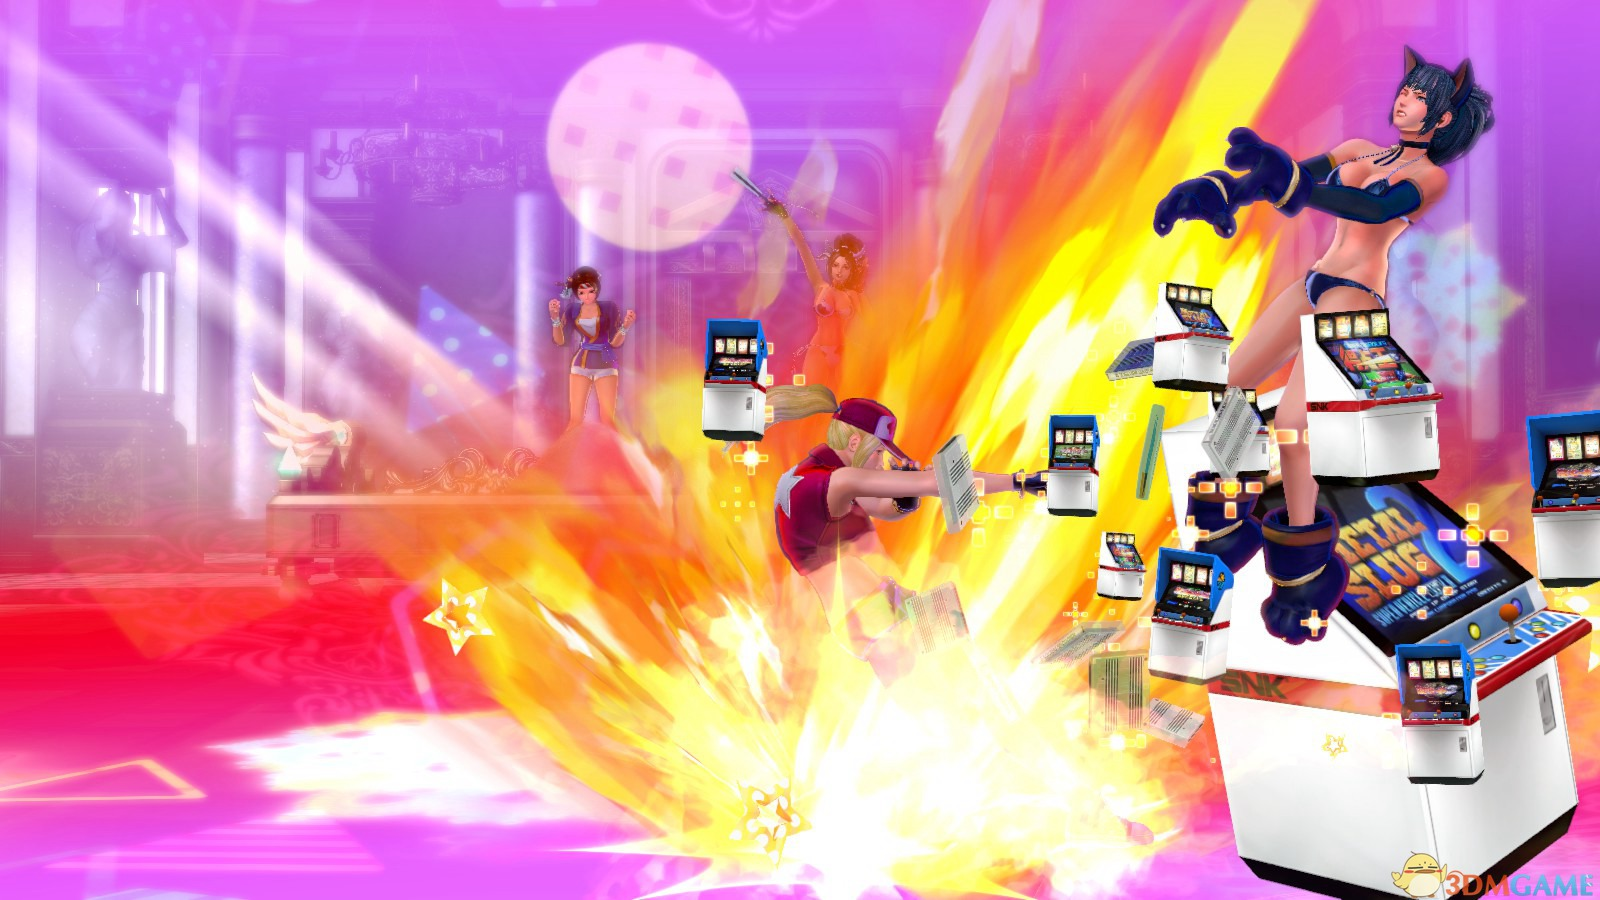 《SNK女格斗家大乱斗》 格斗操作视频演示 全角色结局动画